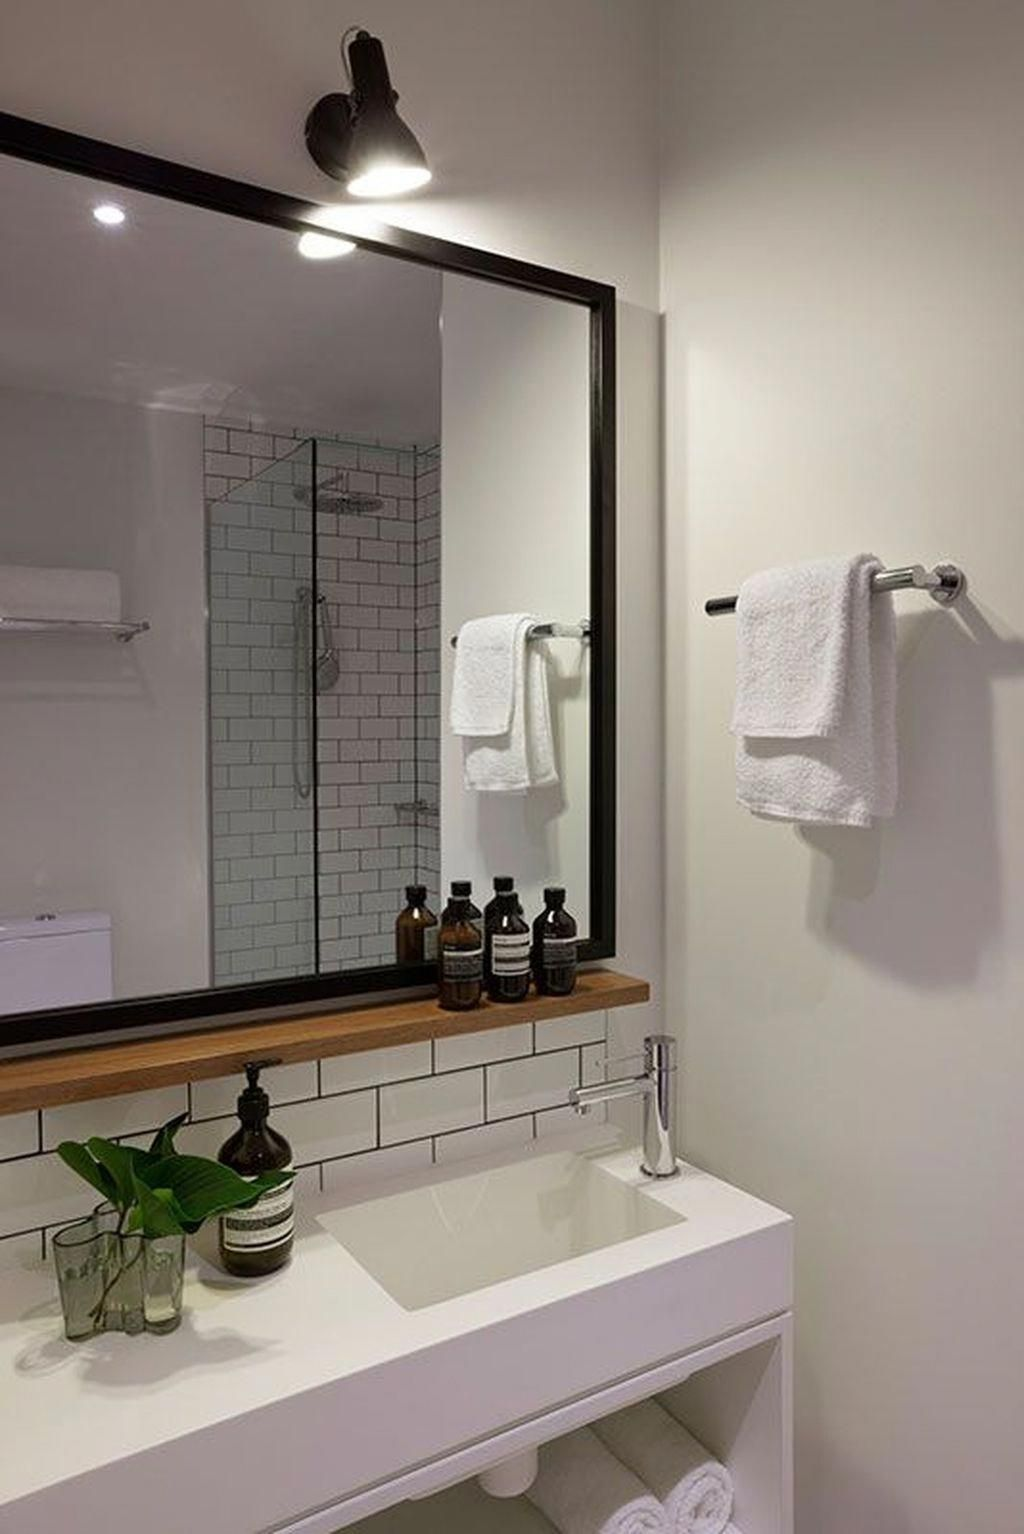 46 Popular Bathroom Mirror Design Ideas For Any Bathroom Model Bathroomfurniturepallet Bathroom Mirror With Shelf Bathroom Mirrors Diy Bathroom Model Popular bathroom mirror with